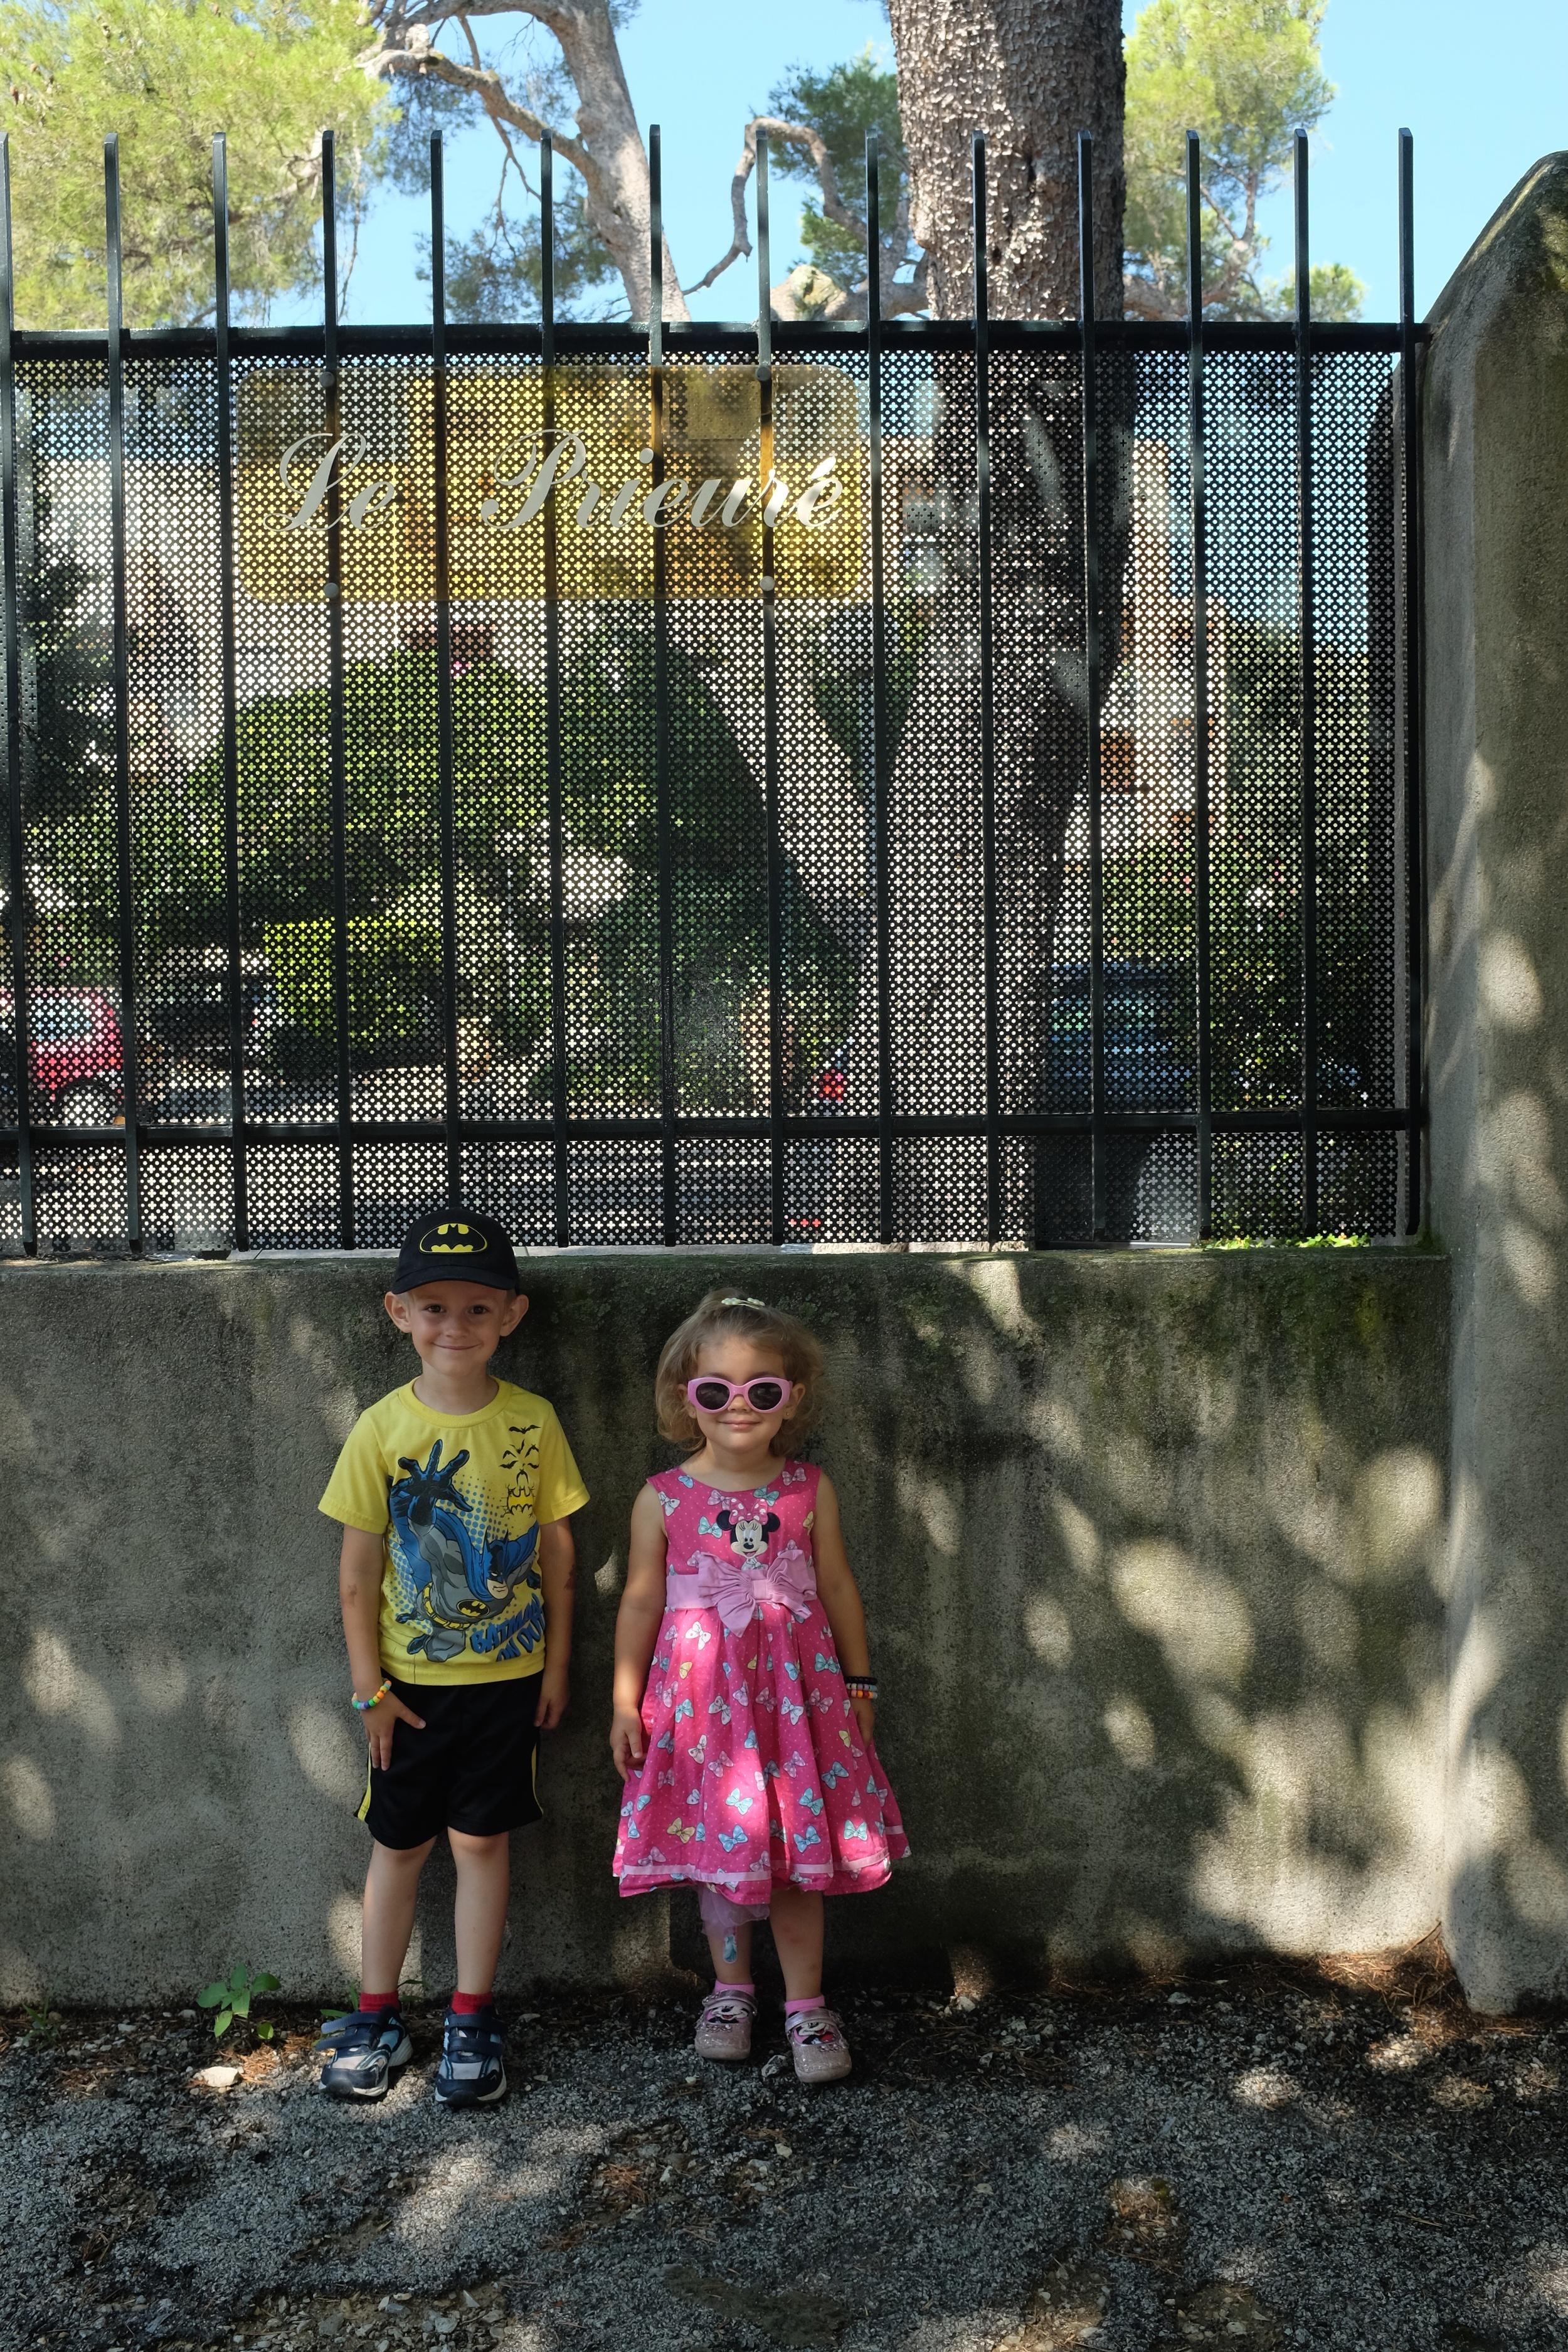 Kian & Hannah right outside the apartment complex